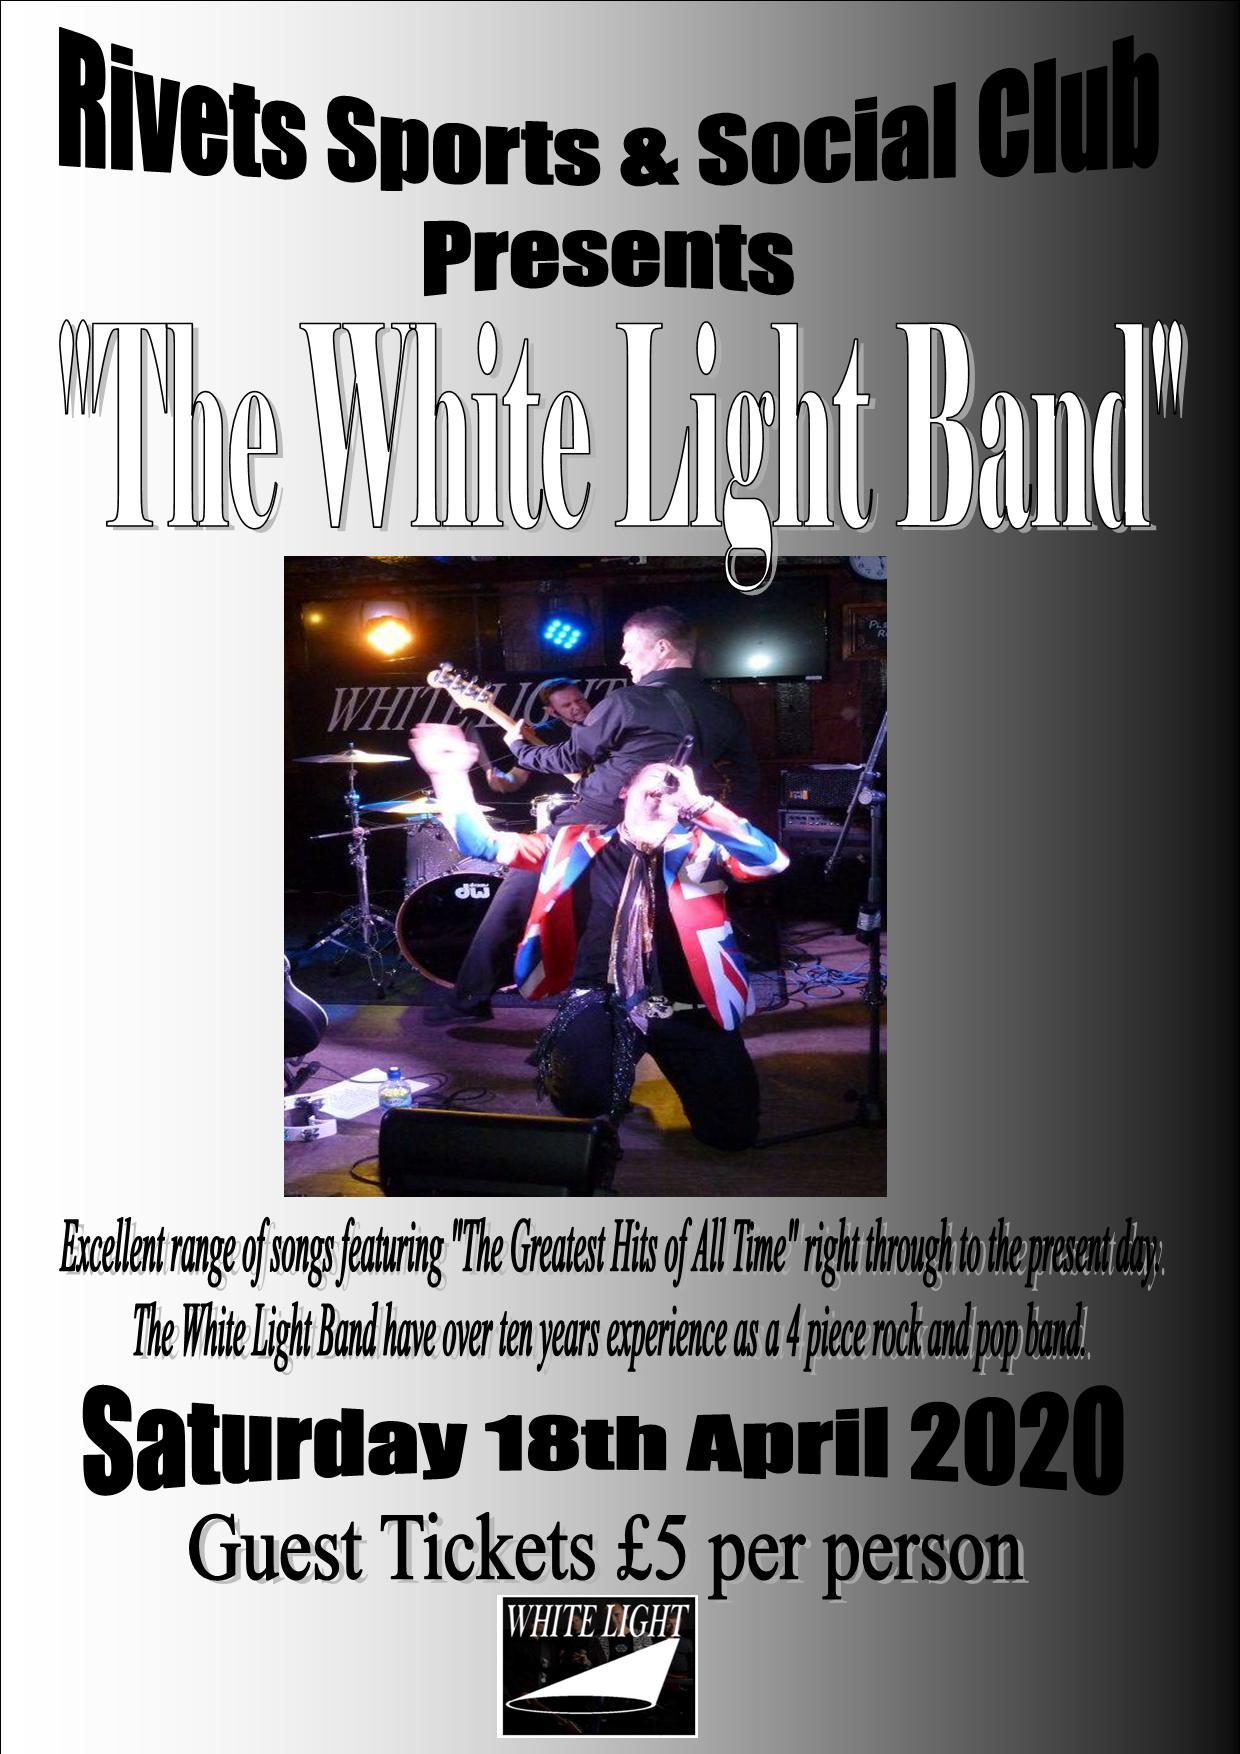 The White Light Band